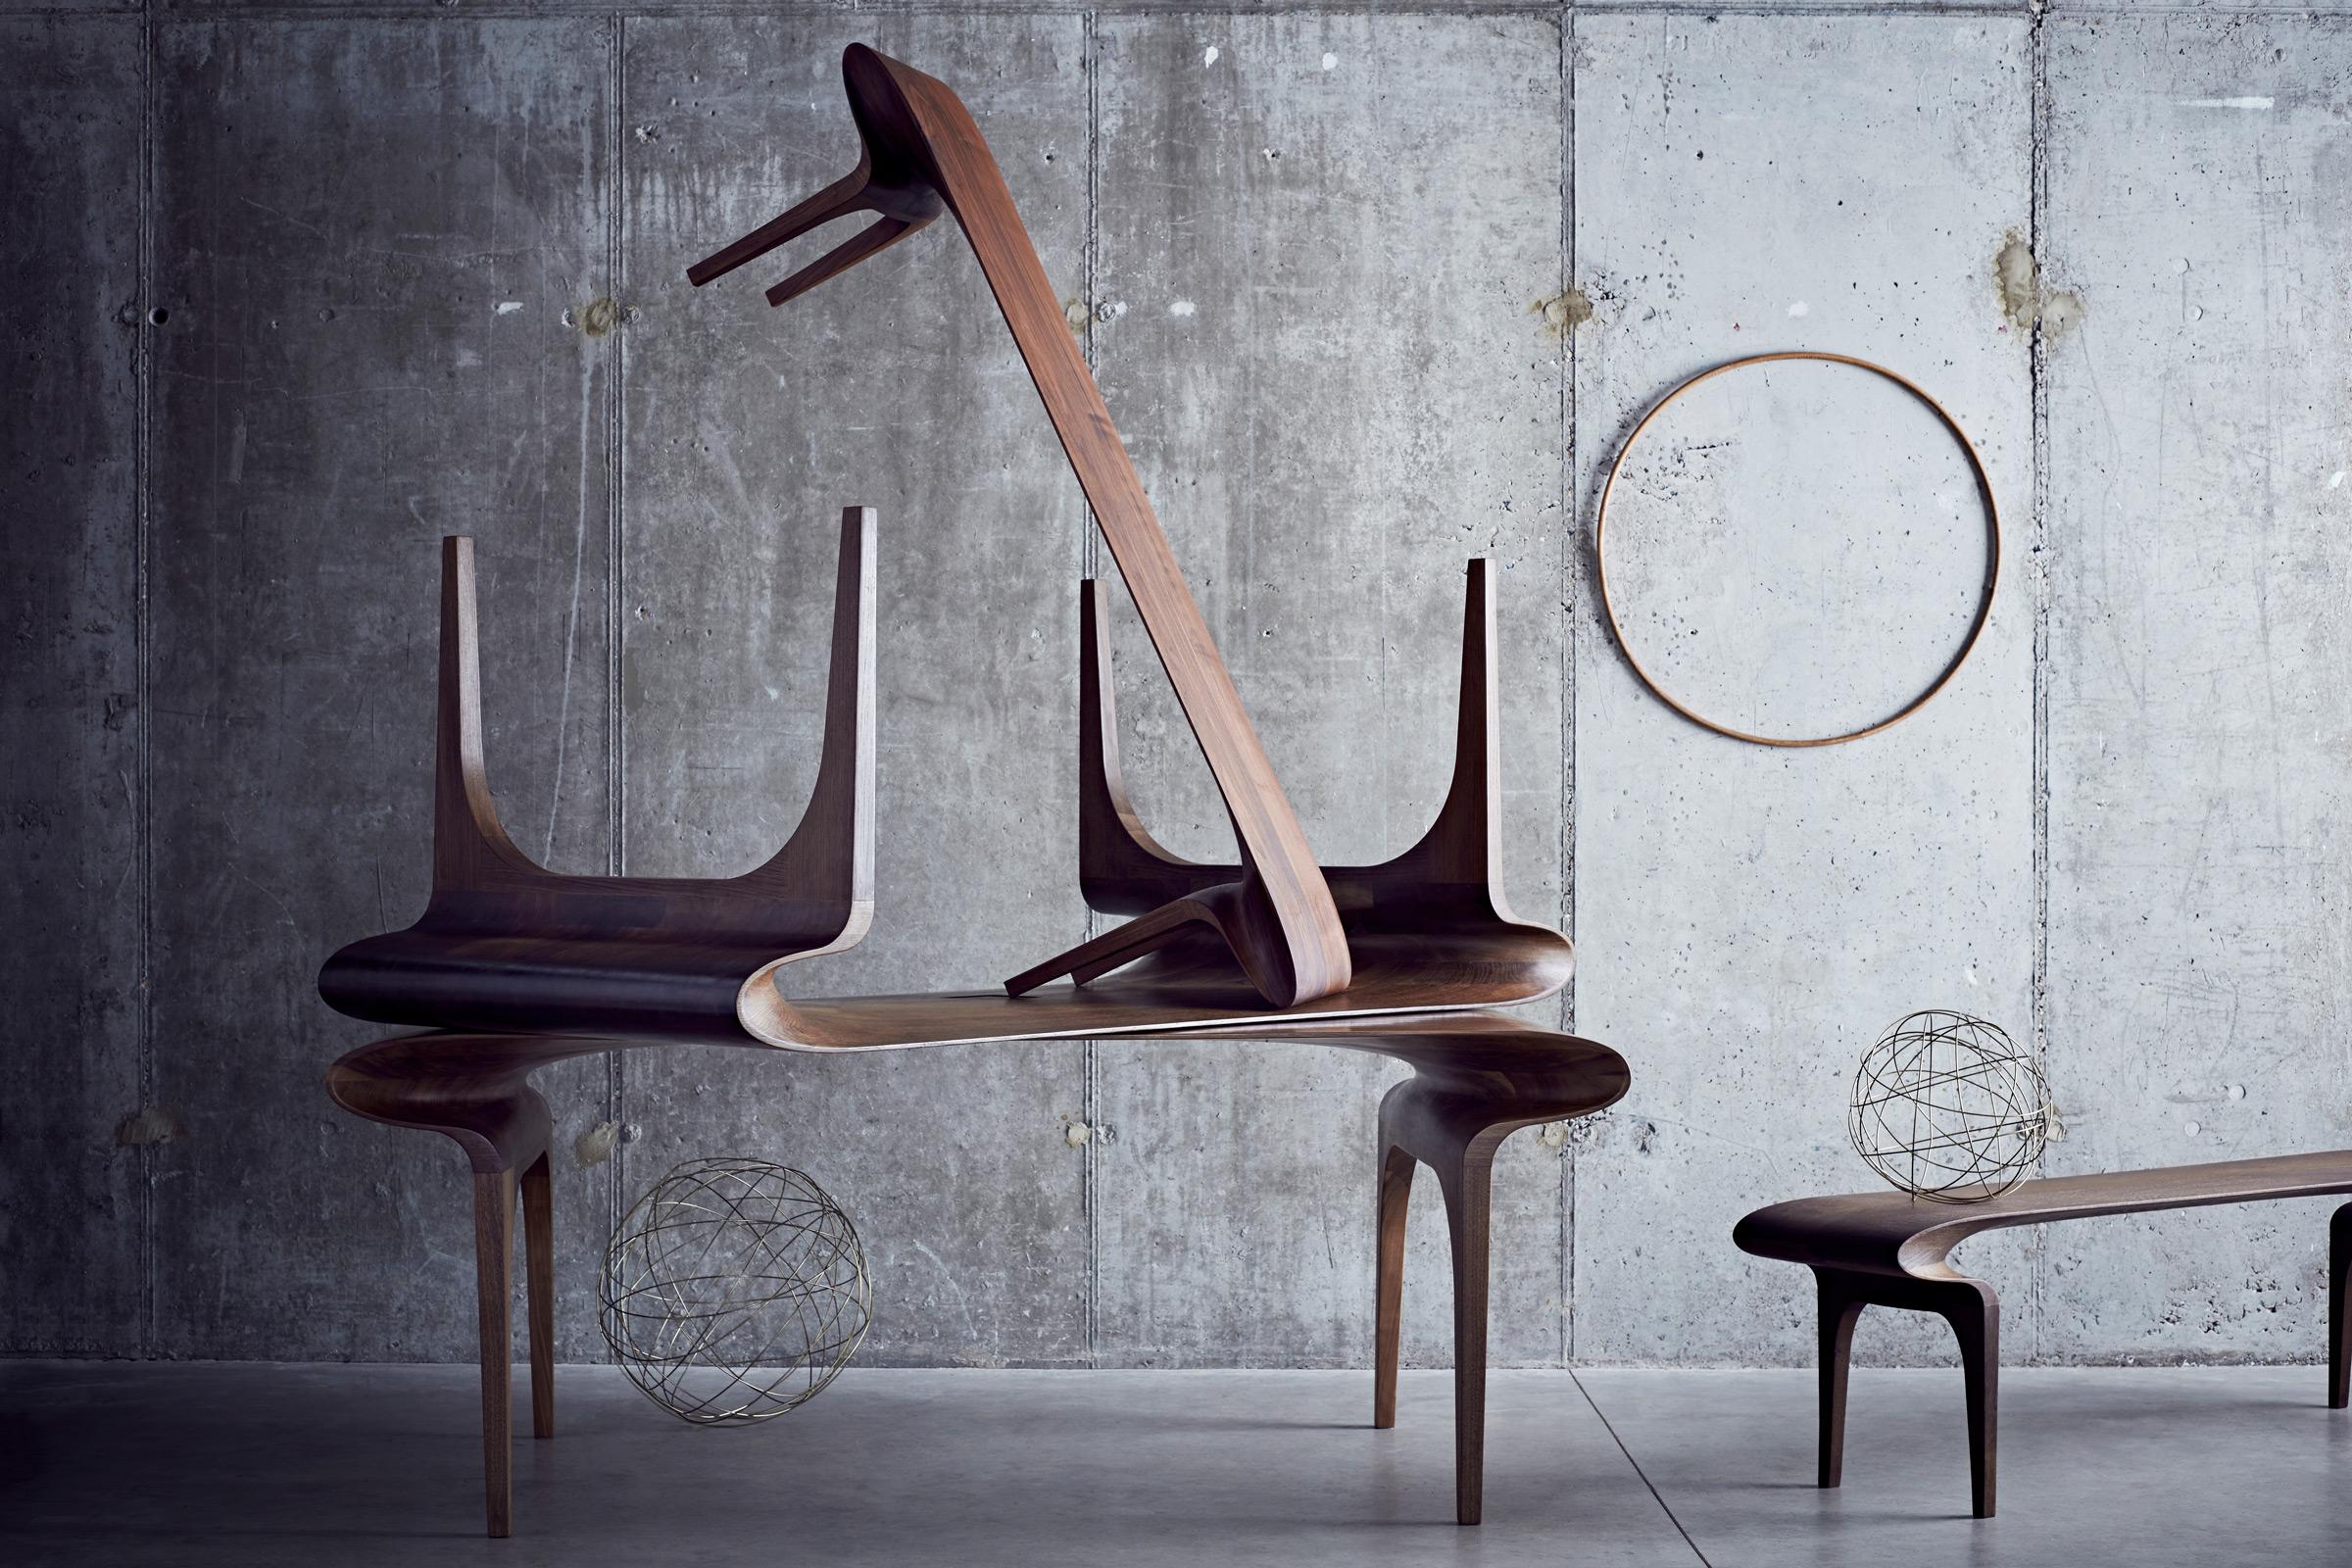 Bodo Sperlein Contour Furniture